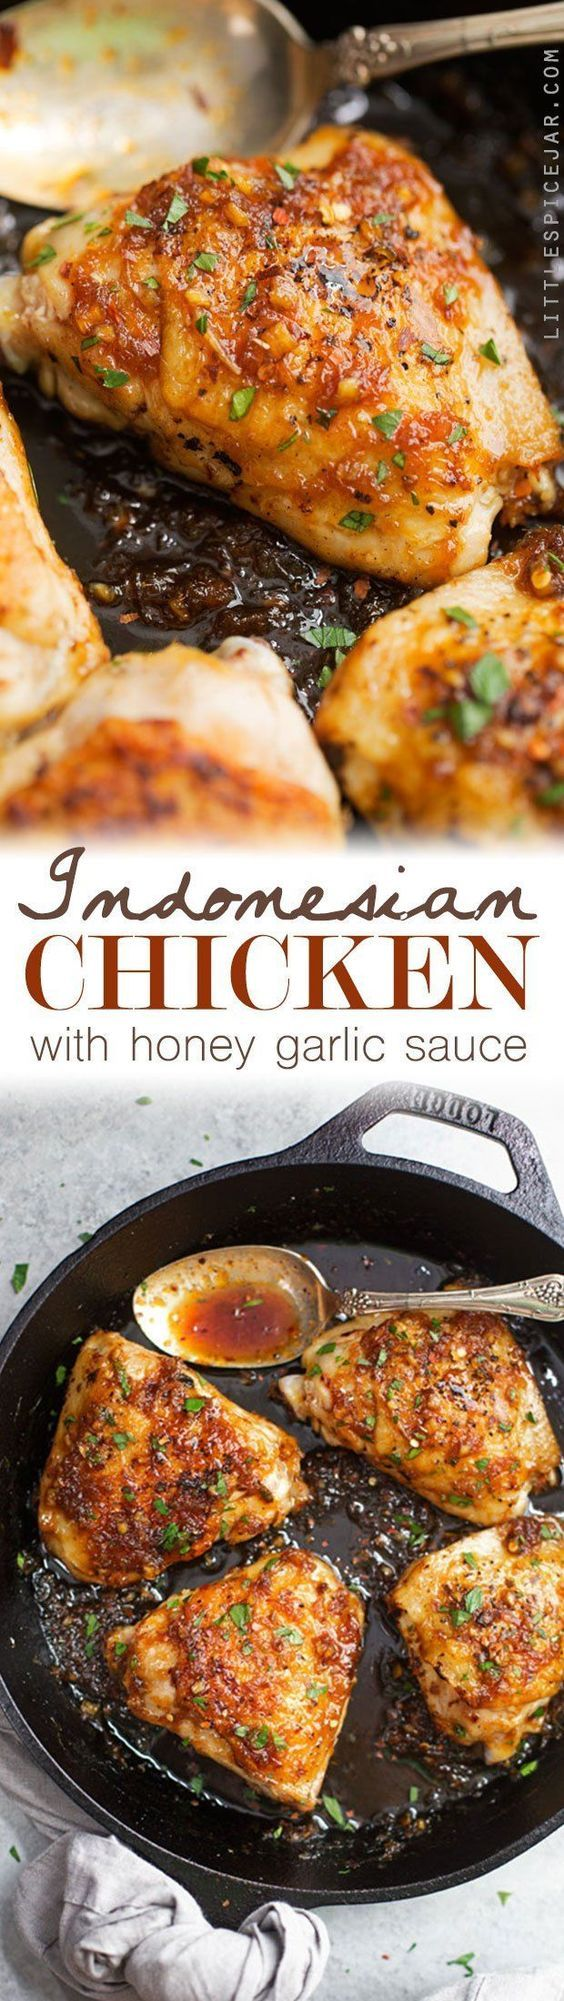 Indonesian Honey Garlic Chicken - Simple chicken thighs spiced up with a homemade honey garlic sauce! #chickenthighs #chicken #honeygarlicchicken   http://Littlespicejar.com